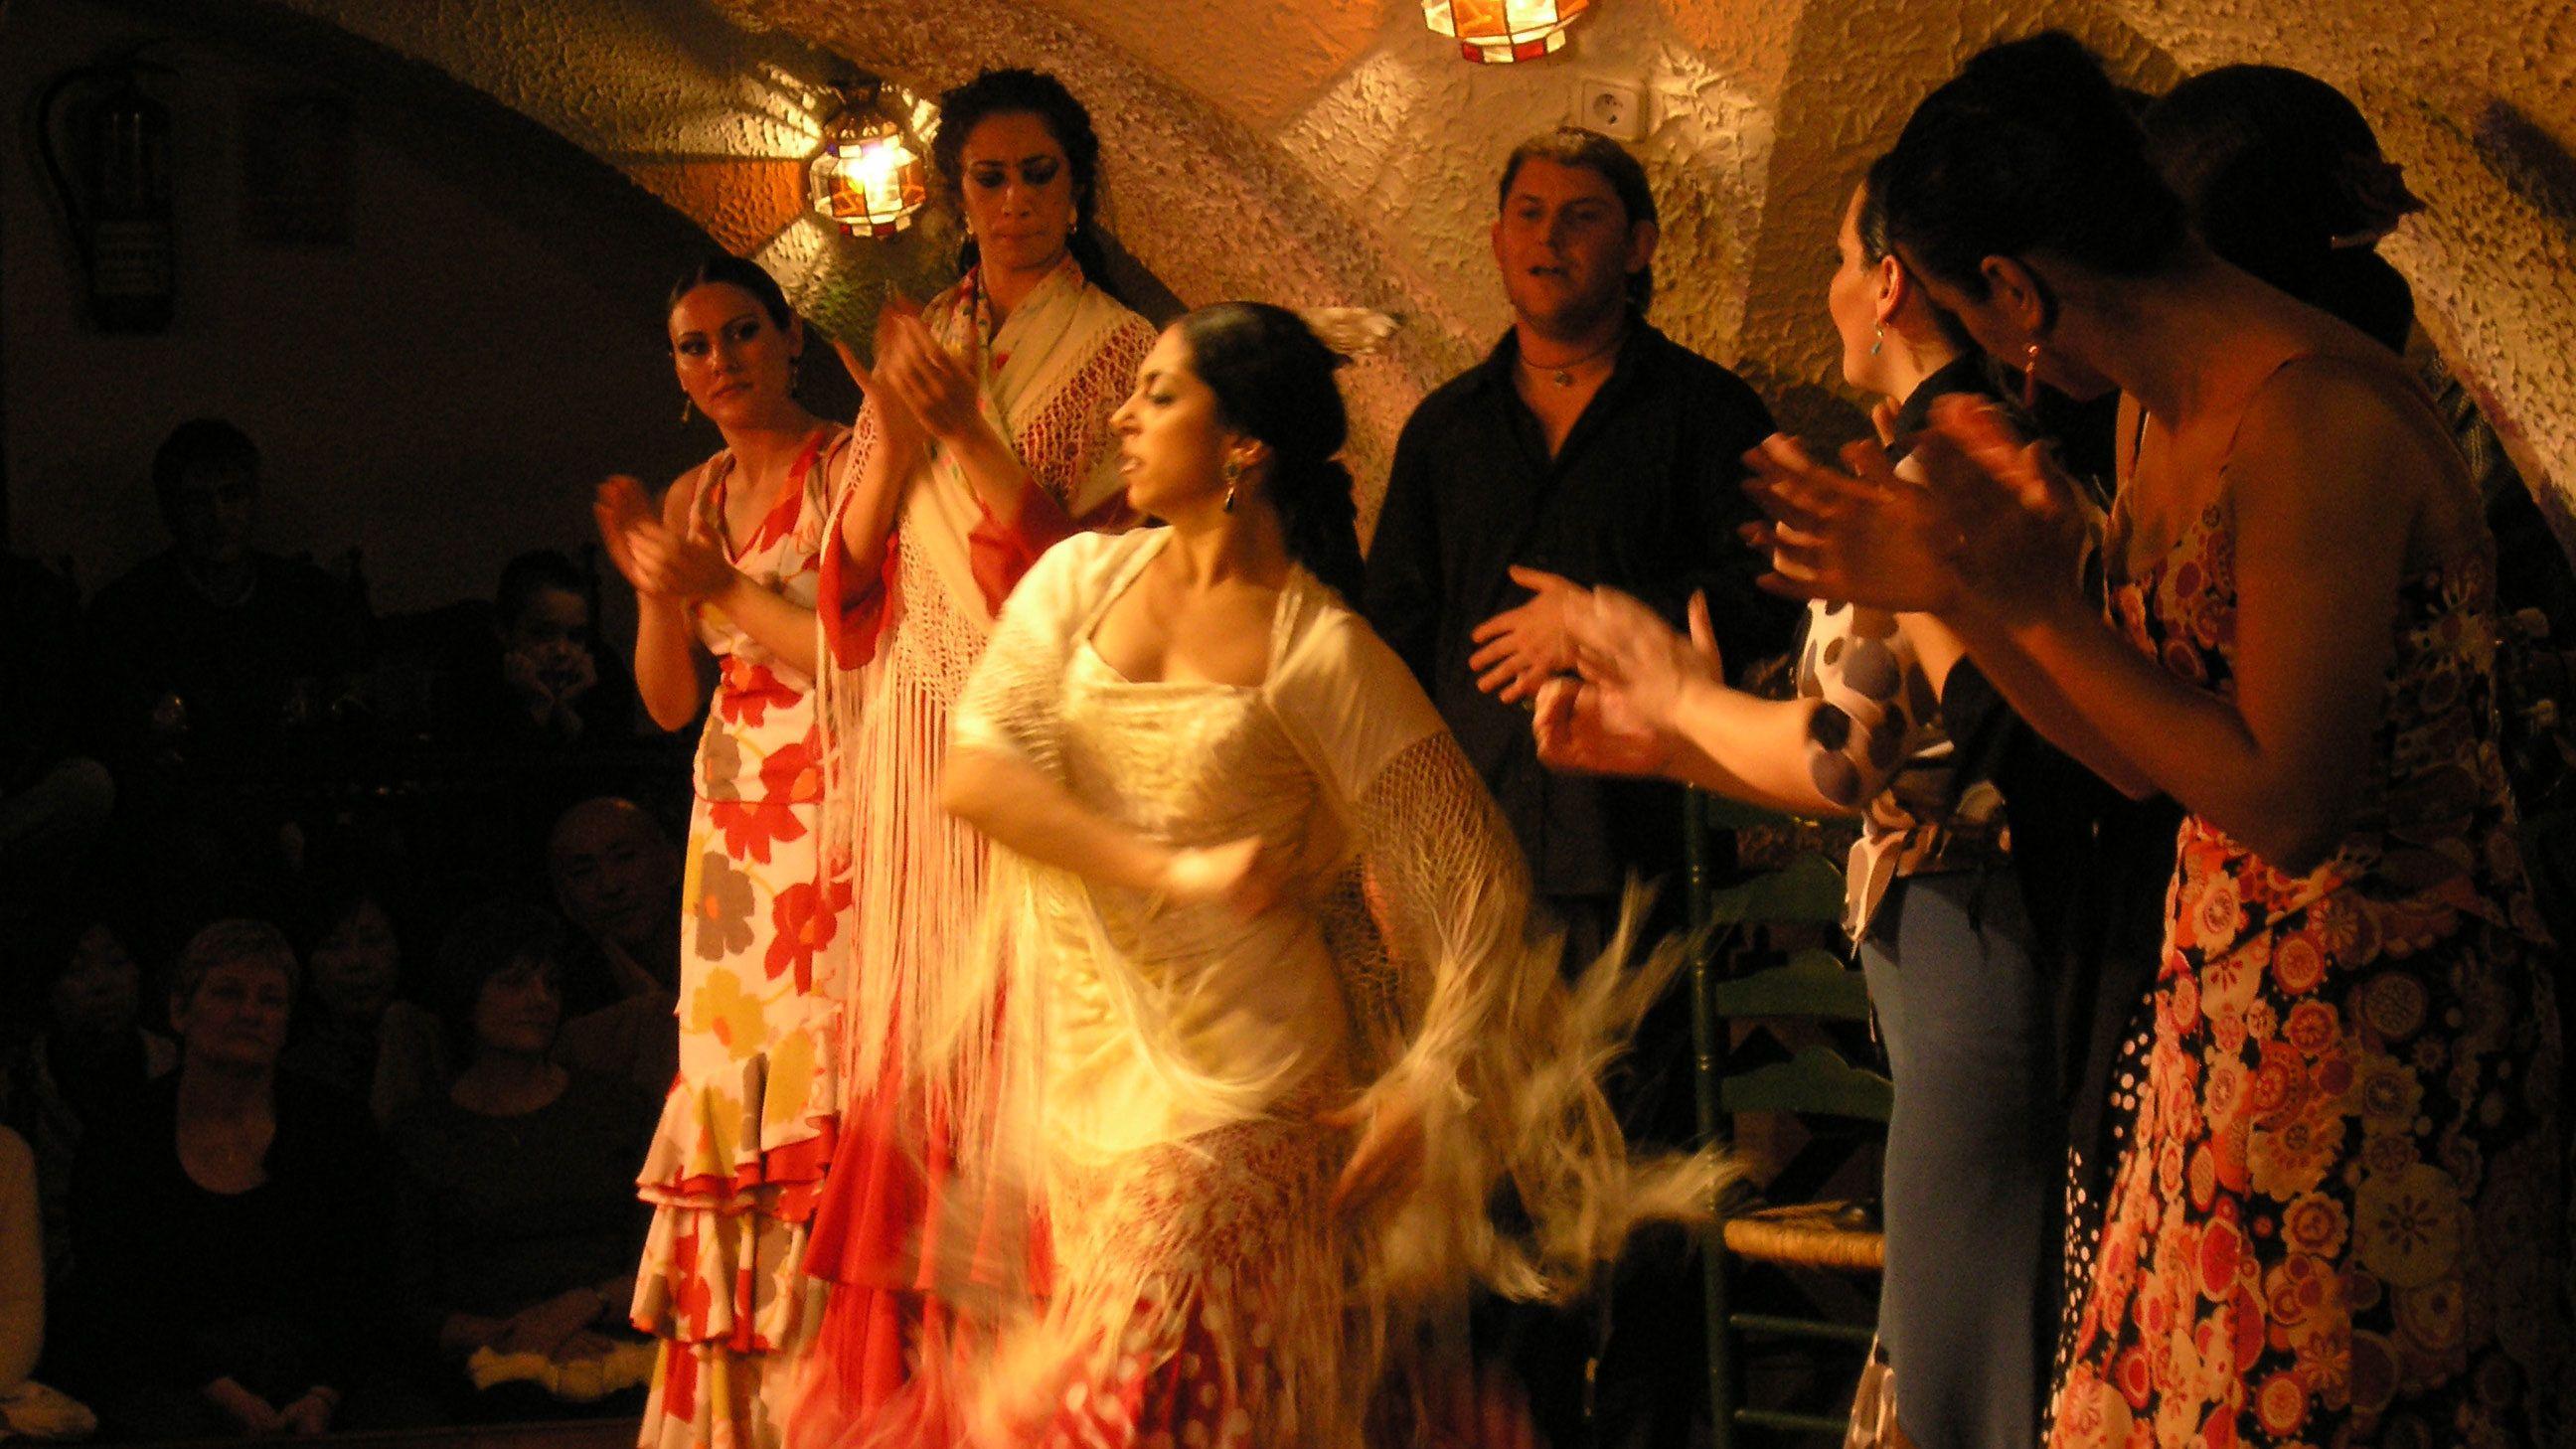 woman flamenco dancing in Barcelona